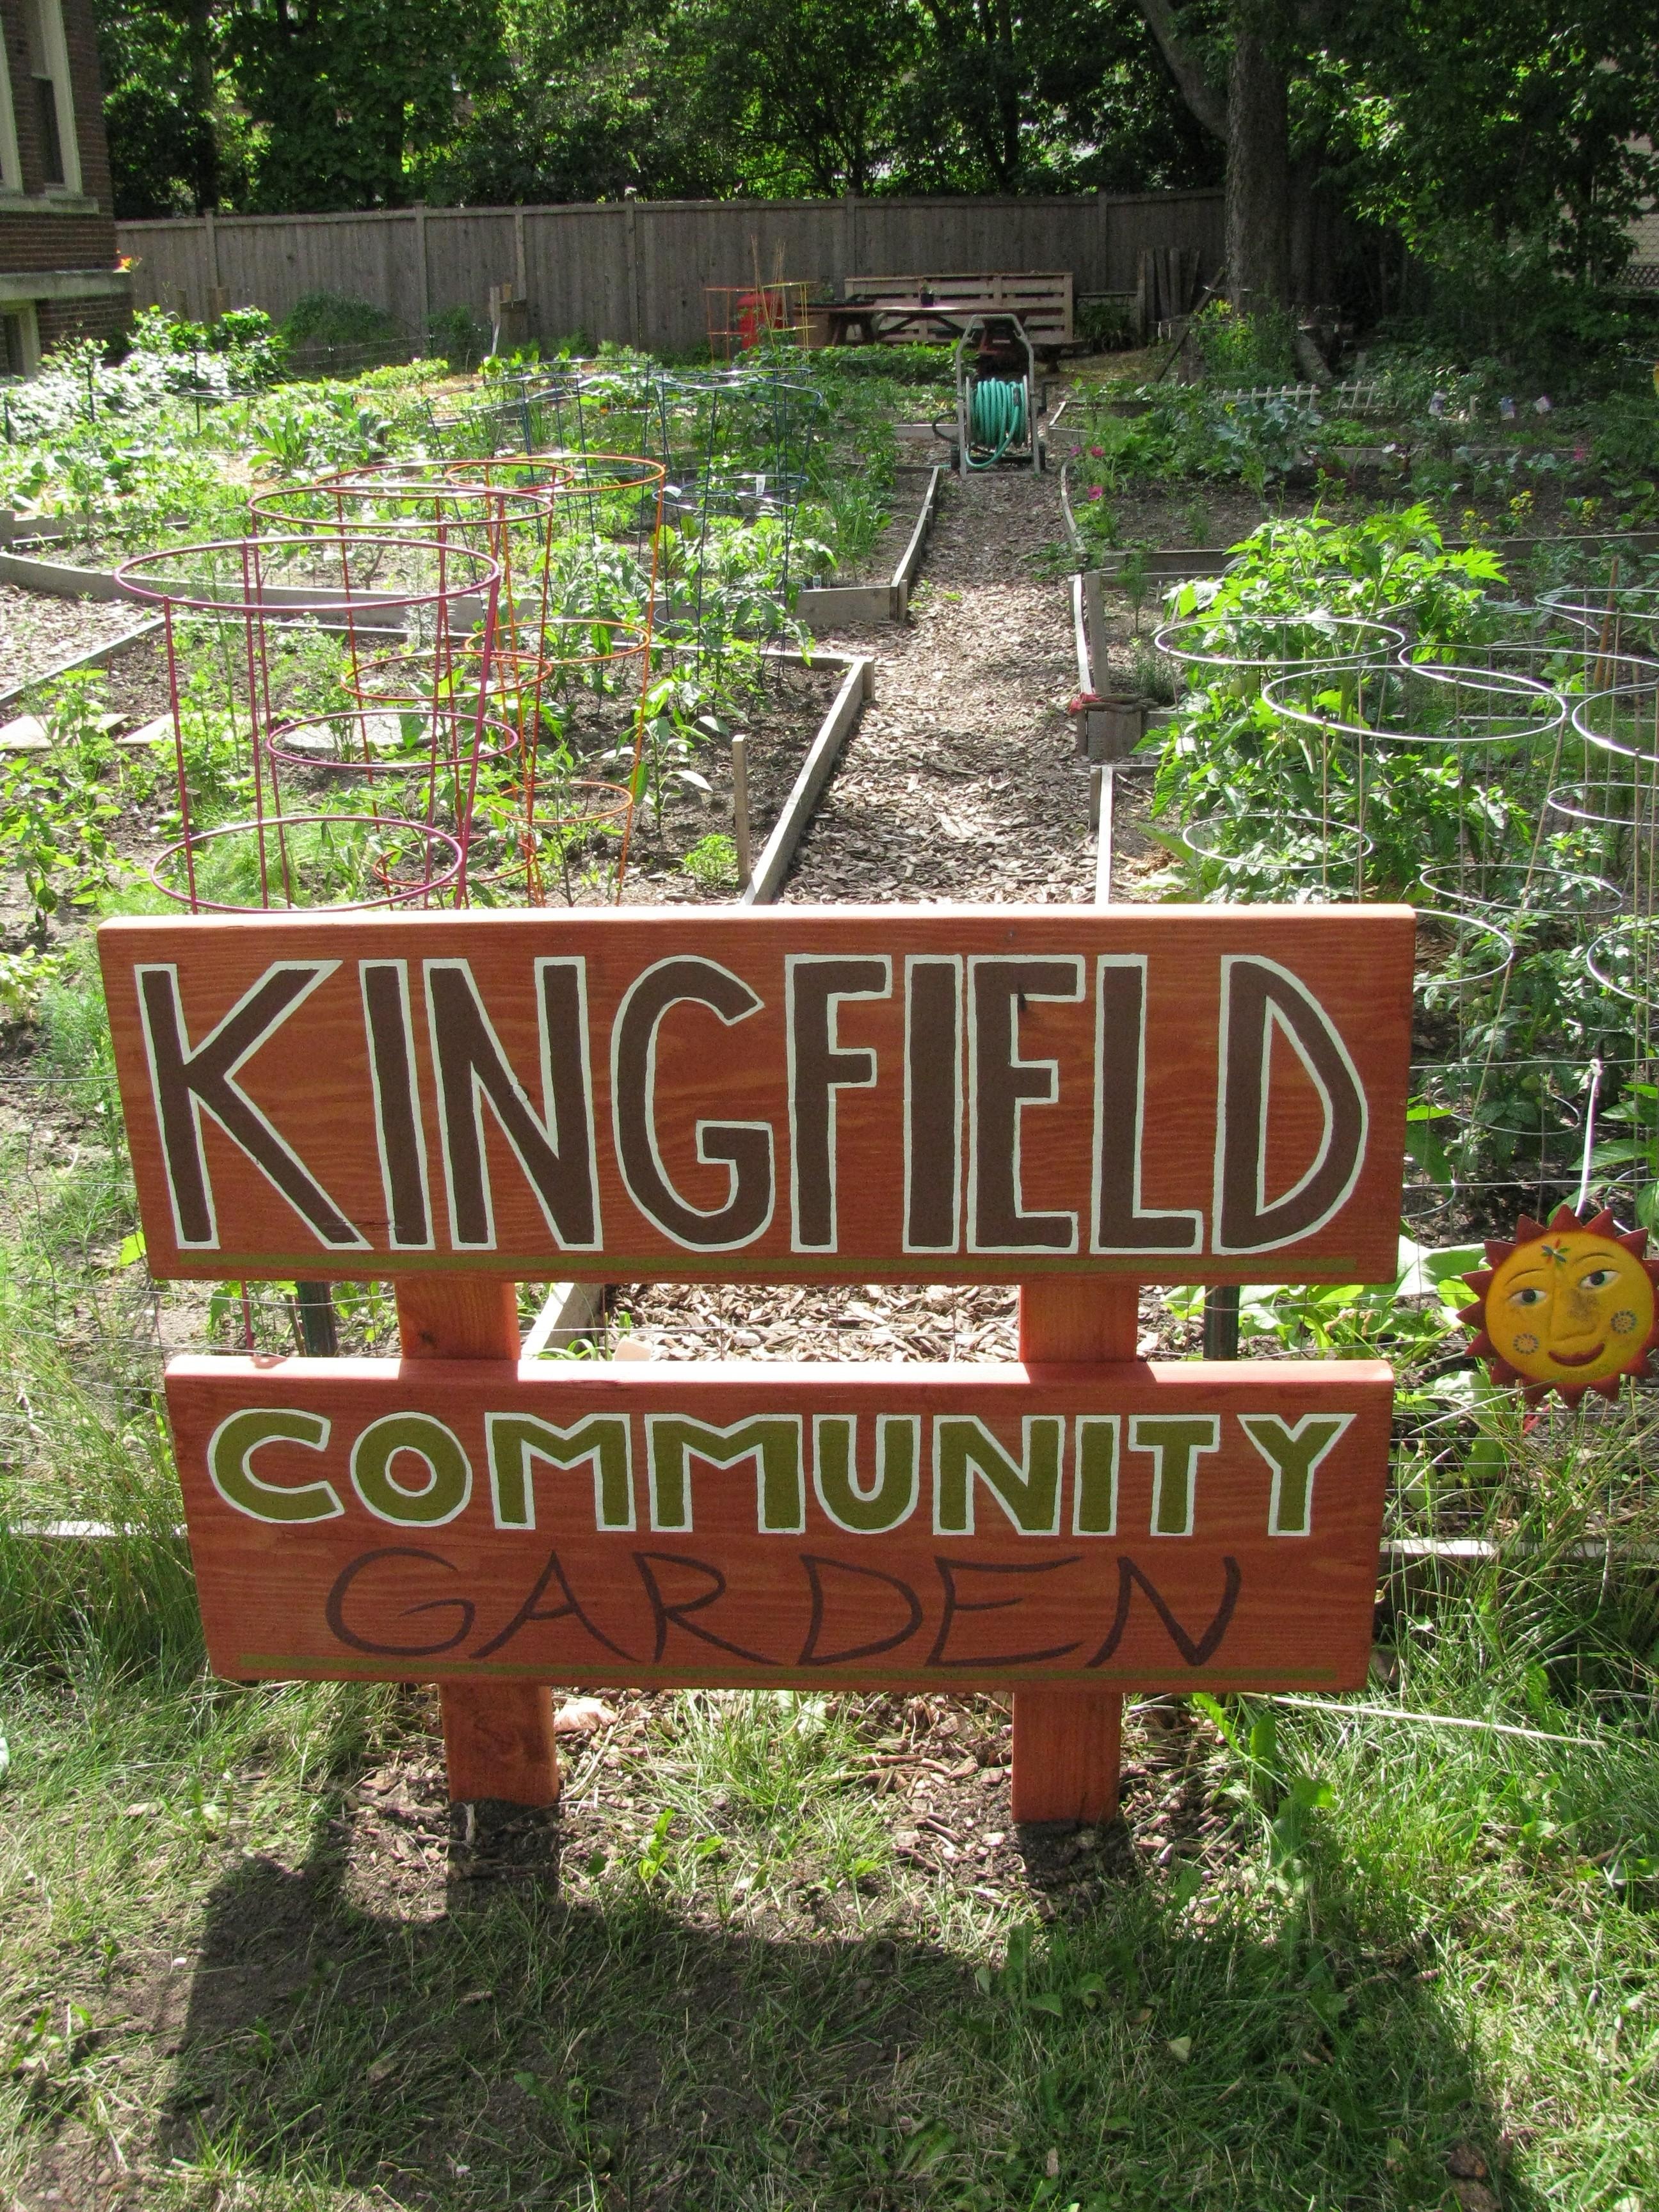 Kingfield's Pleasant Community Garden